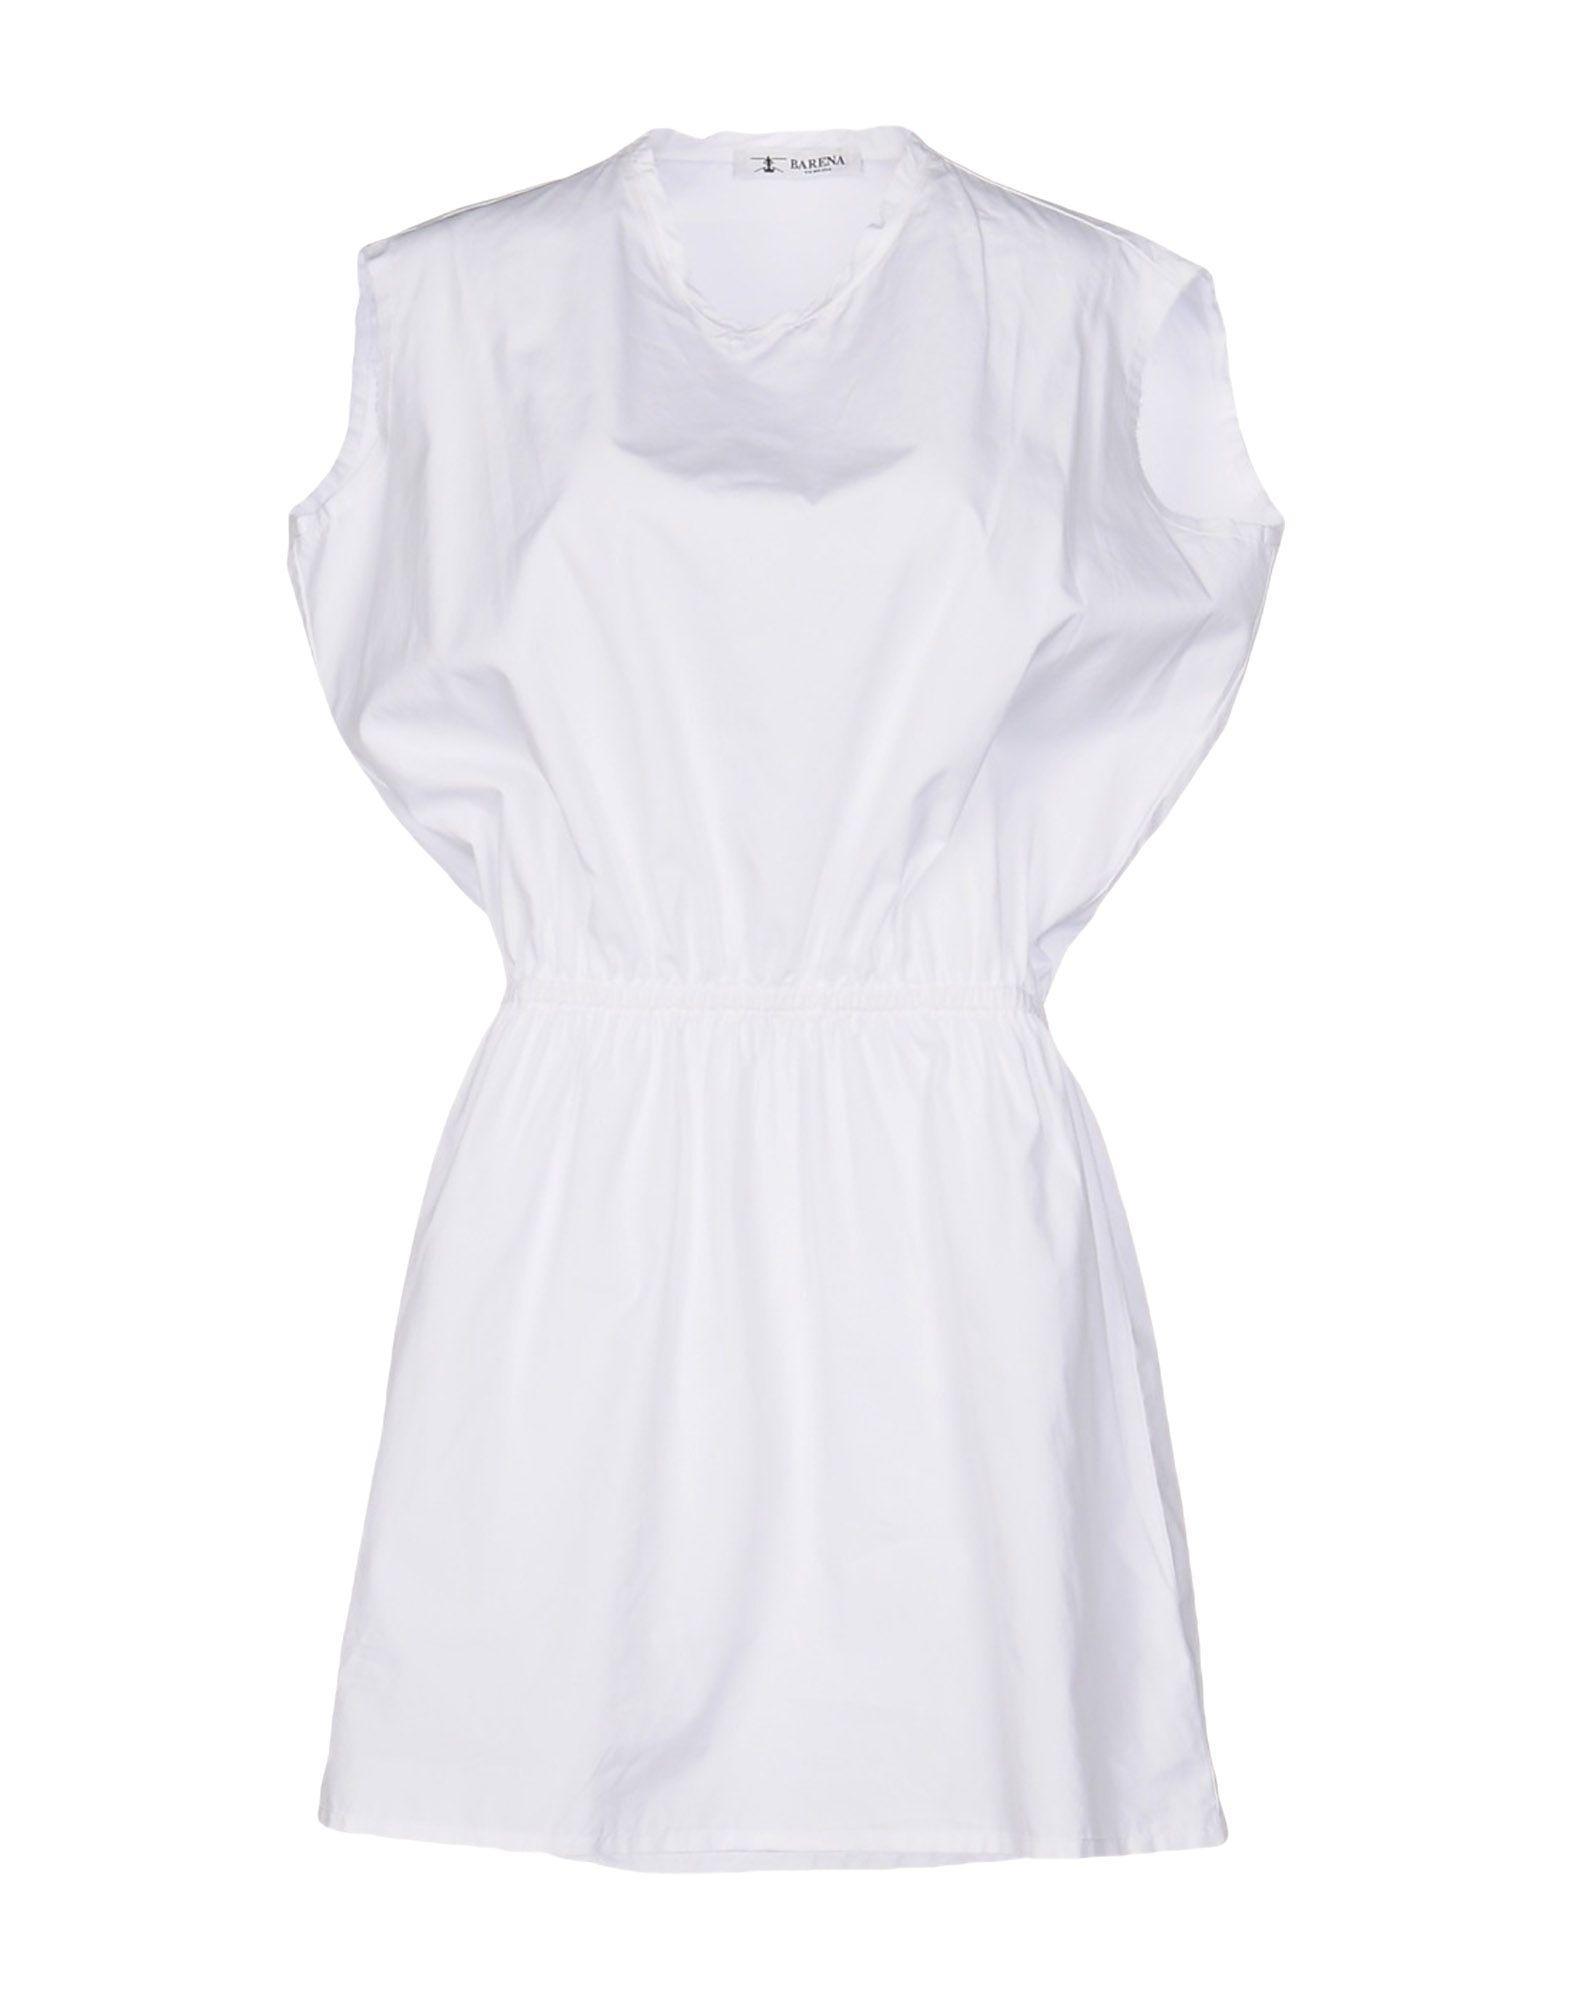 DRESSES - Short dresses Barena VD6Hq2S